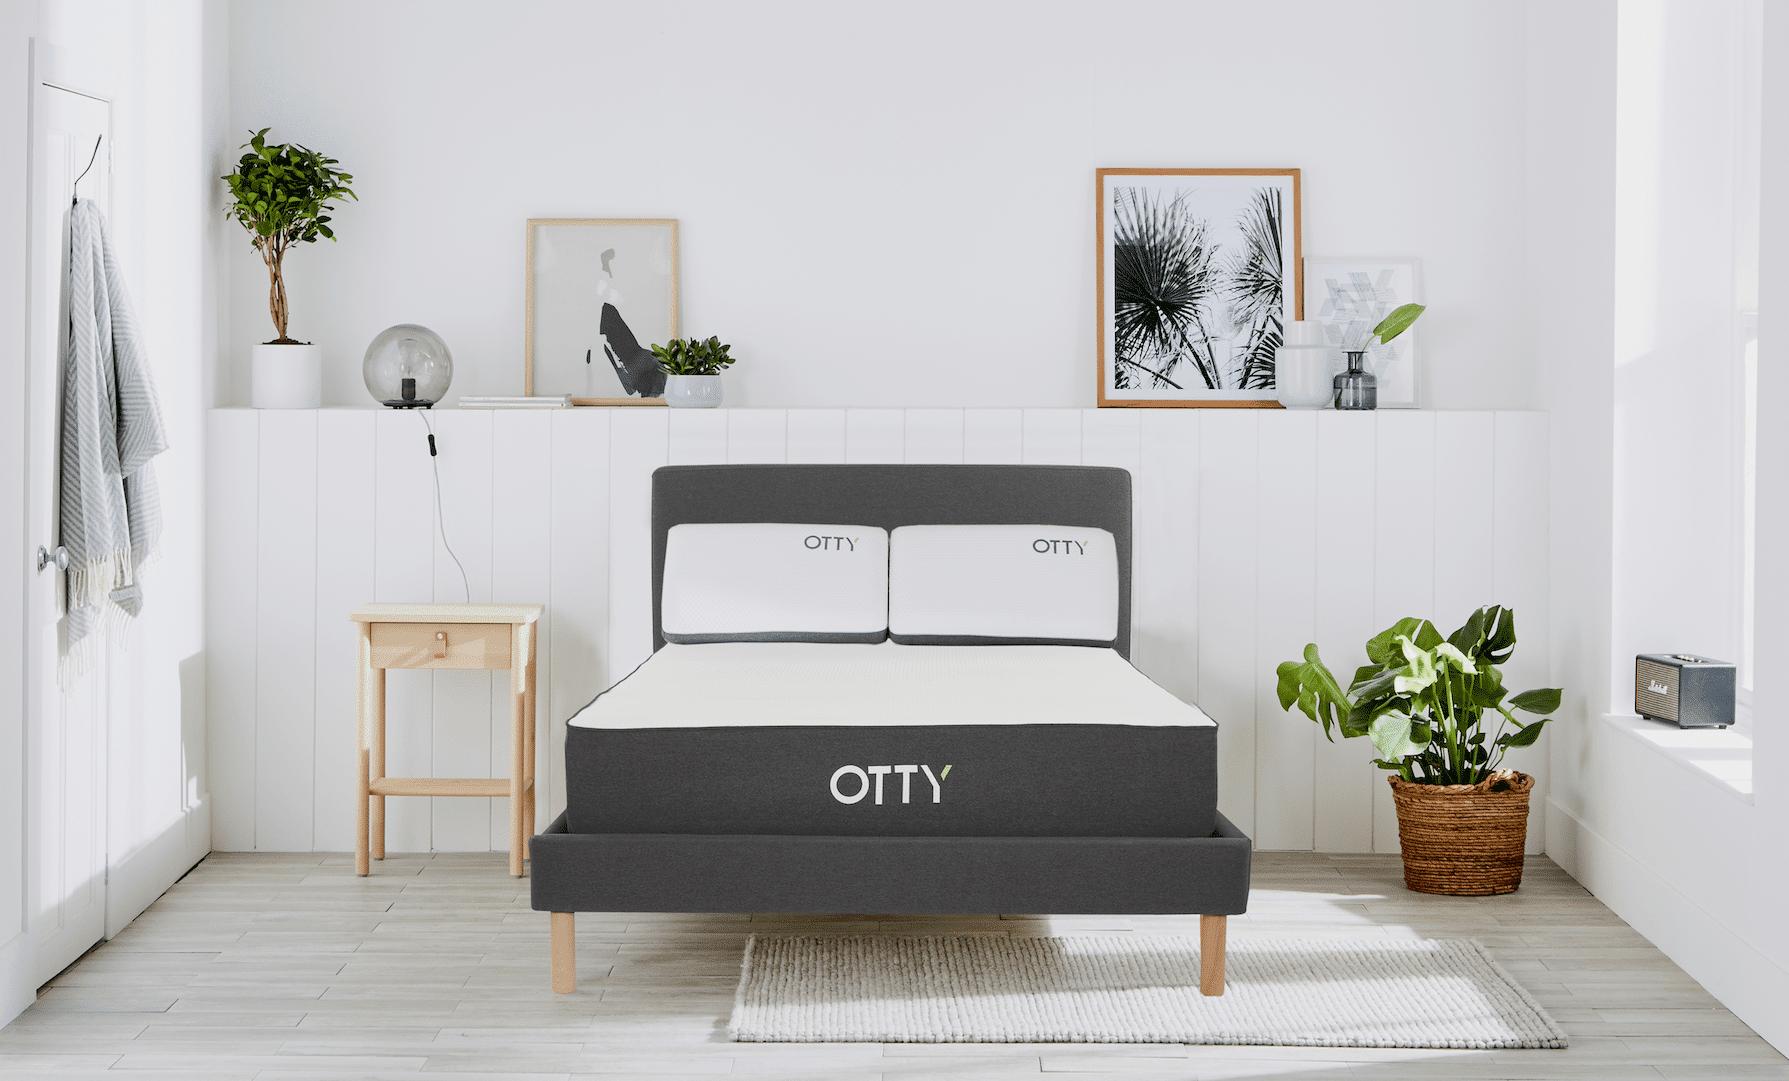 OTTY Sleep OTTY Hybrid Mattress, Bed Frame & Deluxe Pillows, Super King   W180 L200 H25 cm